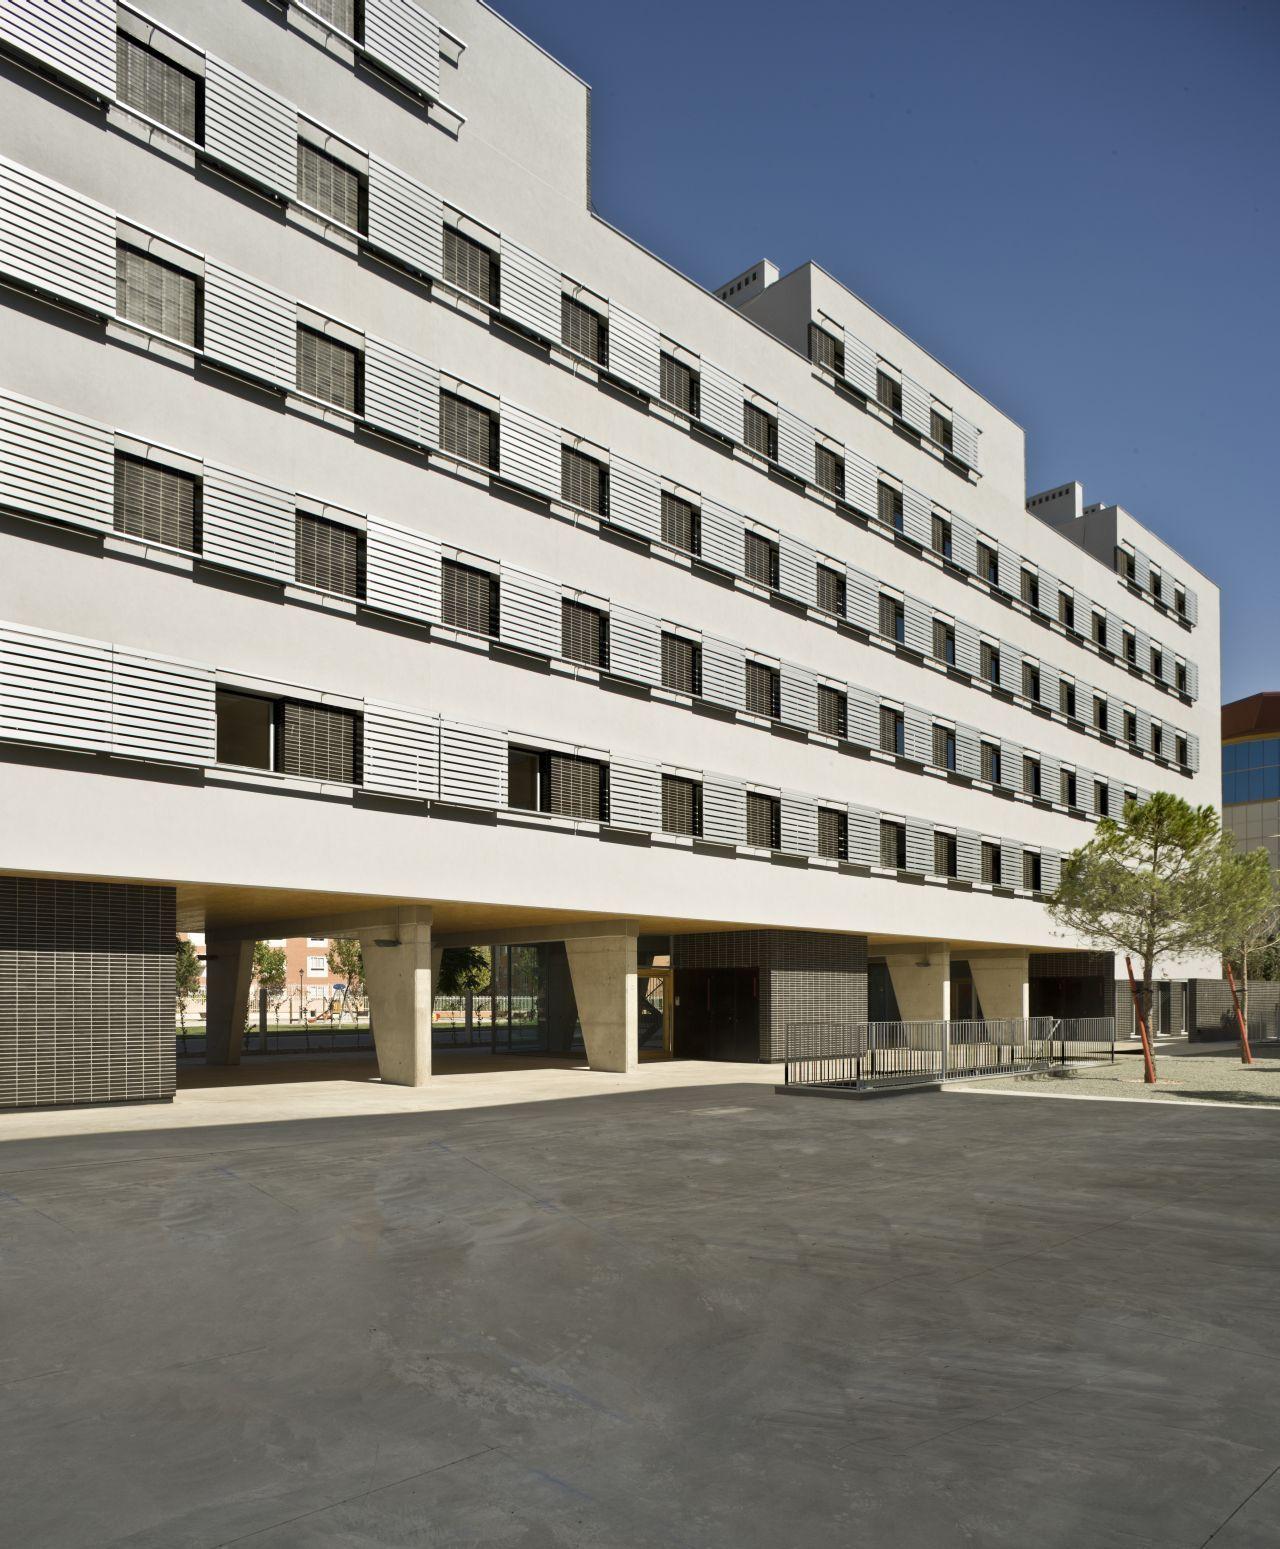 Galeria de conjunto habitacional em albacete burgos garrido arquitectos 1 - Arquitectos albacete ...